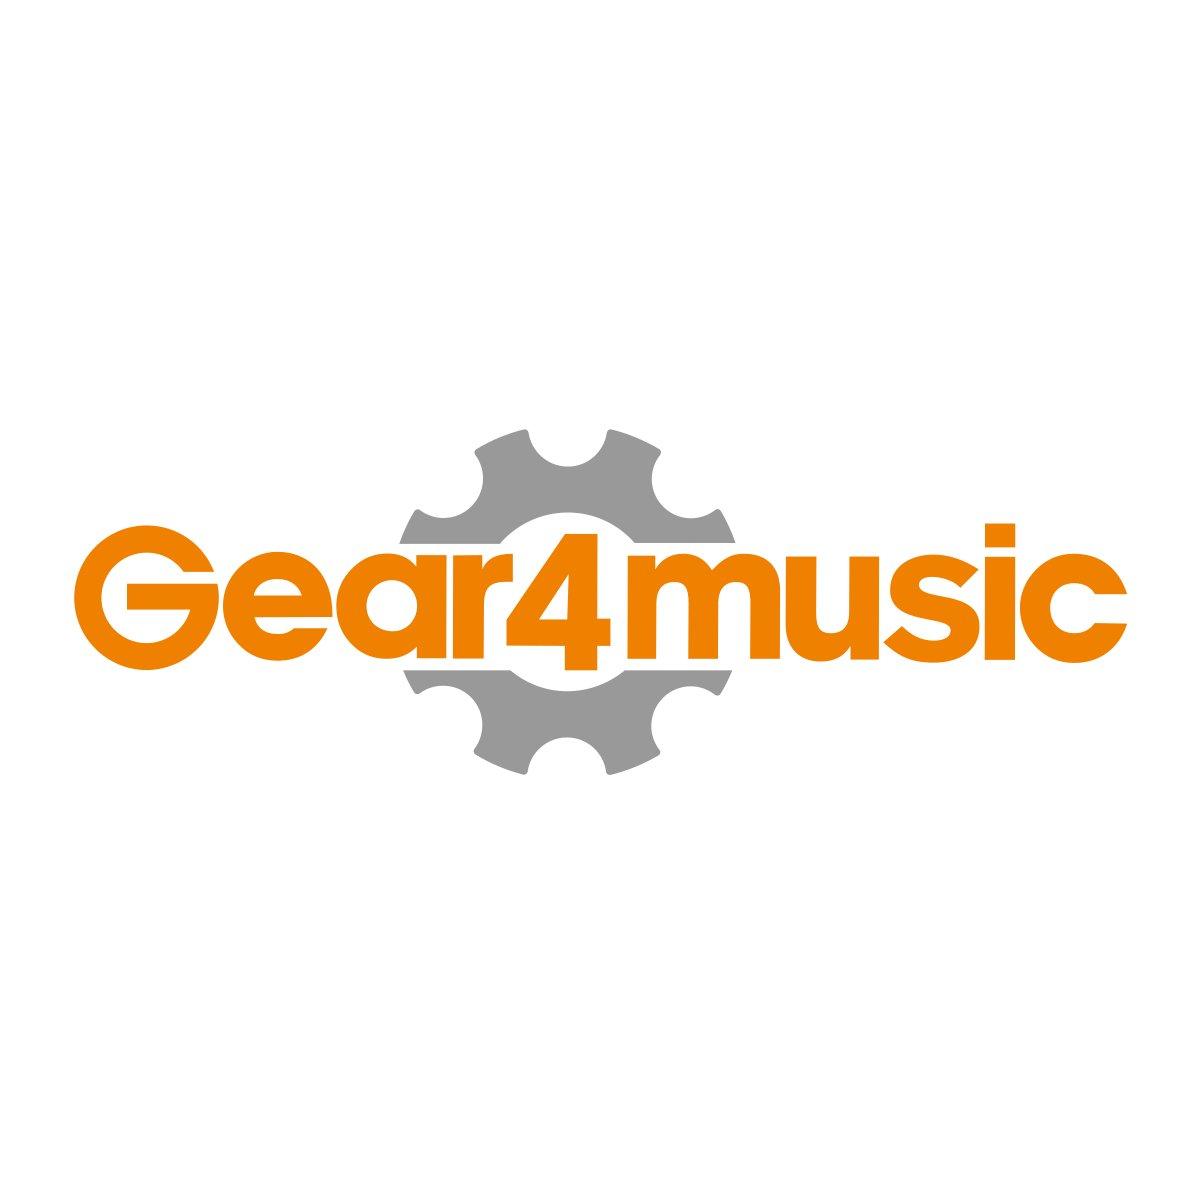 Fender Jim Root Telecaster, Flat White at Gear4music.com